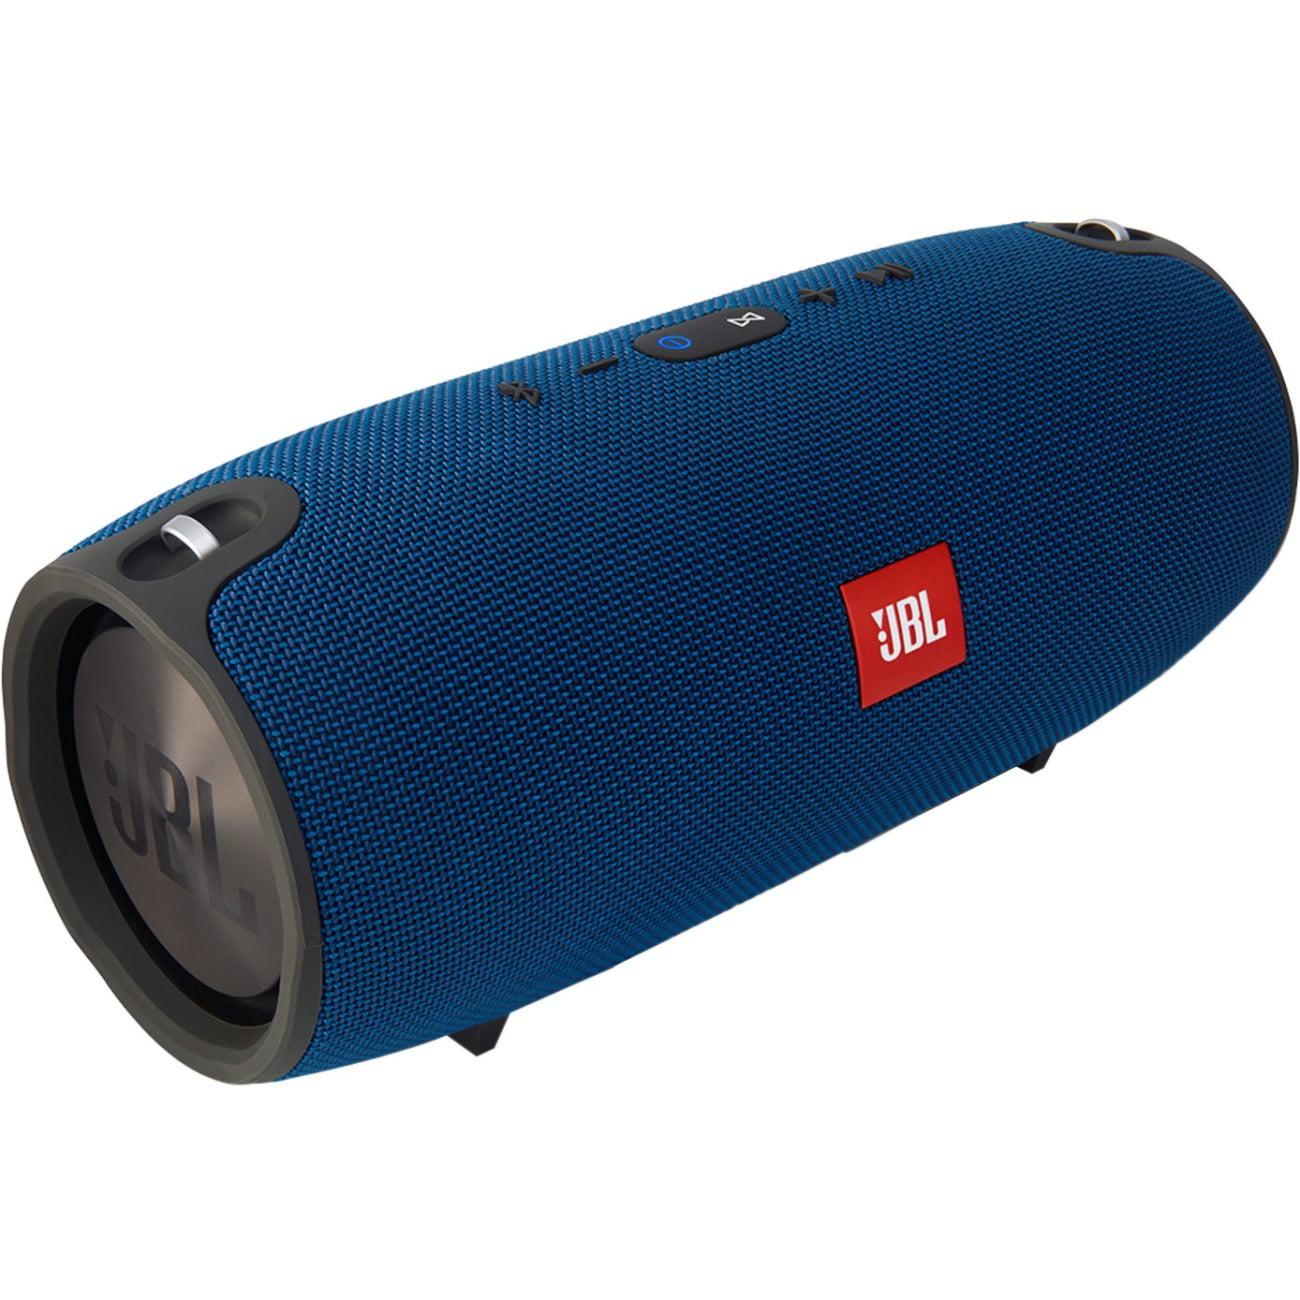 JBL Style Portable Waterproof Black Bluetooth Speaker Wireless New Wood XTREME